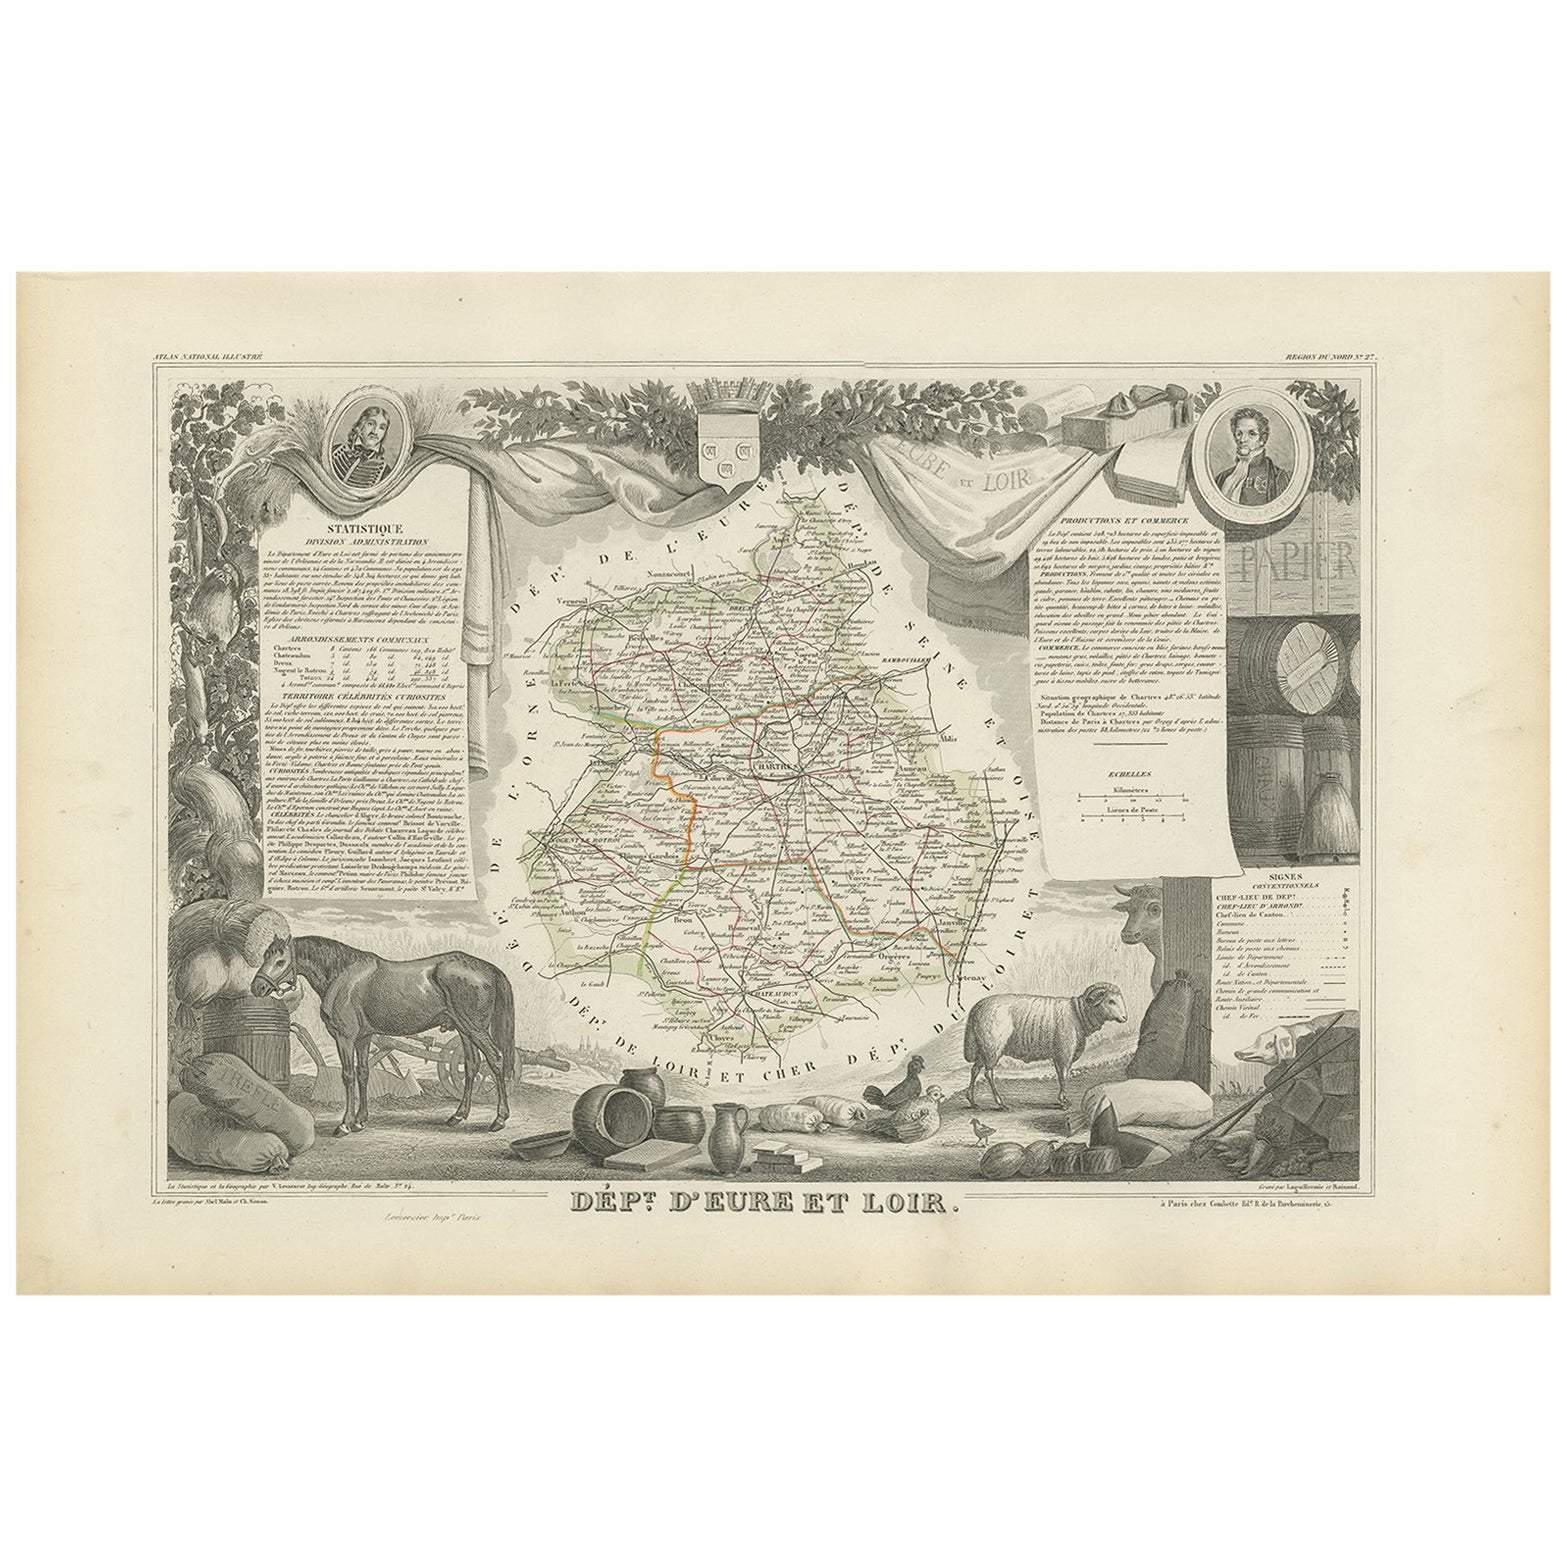 Antique Map of Eure Et Loir 'France' by v. Levasseur, 1854